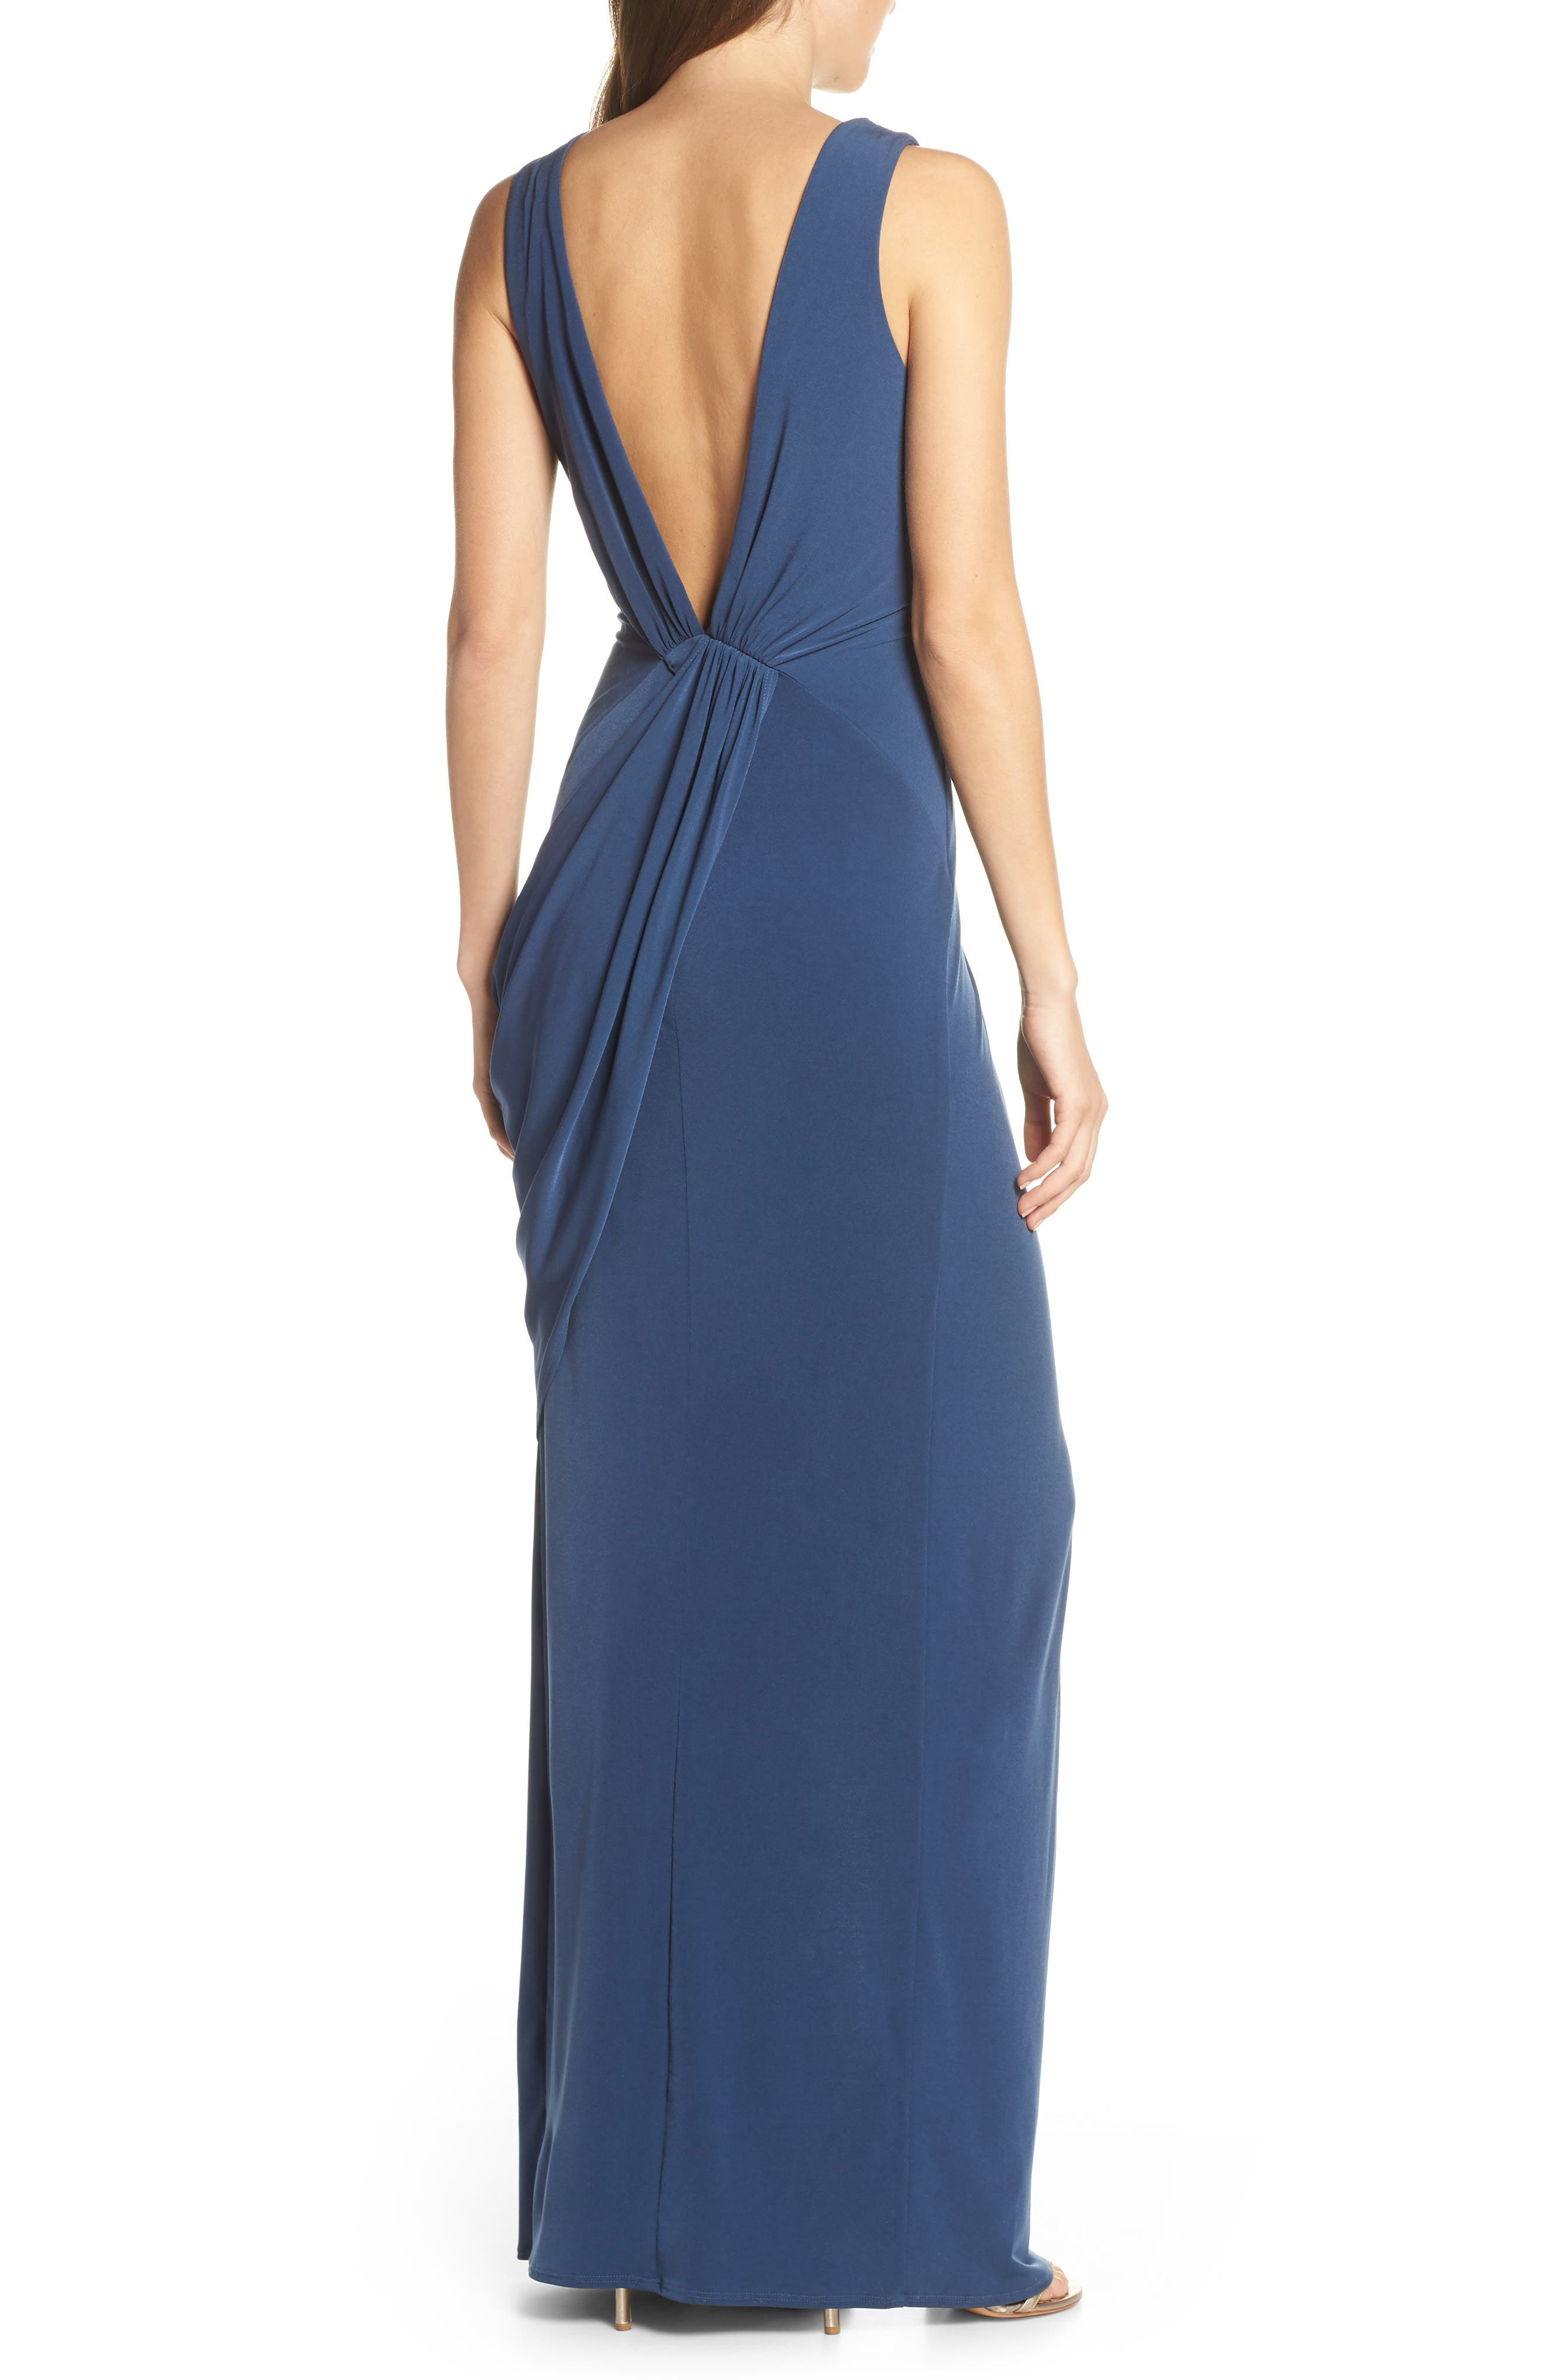 KATIE MAY, Leo Twist Front Evening Dress, Alternate thumbnail 2, color, DEEP SEA